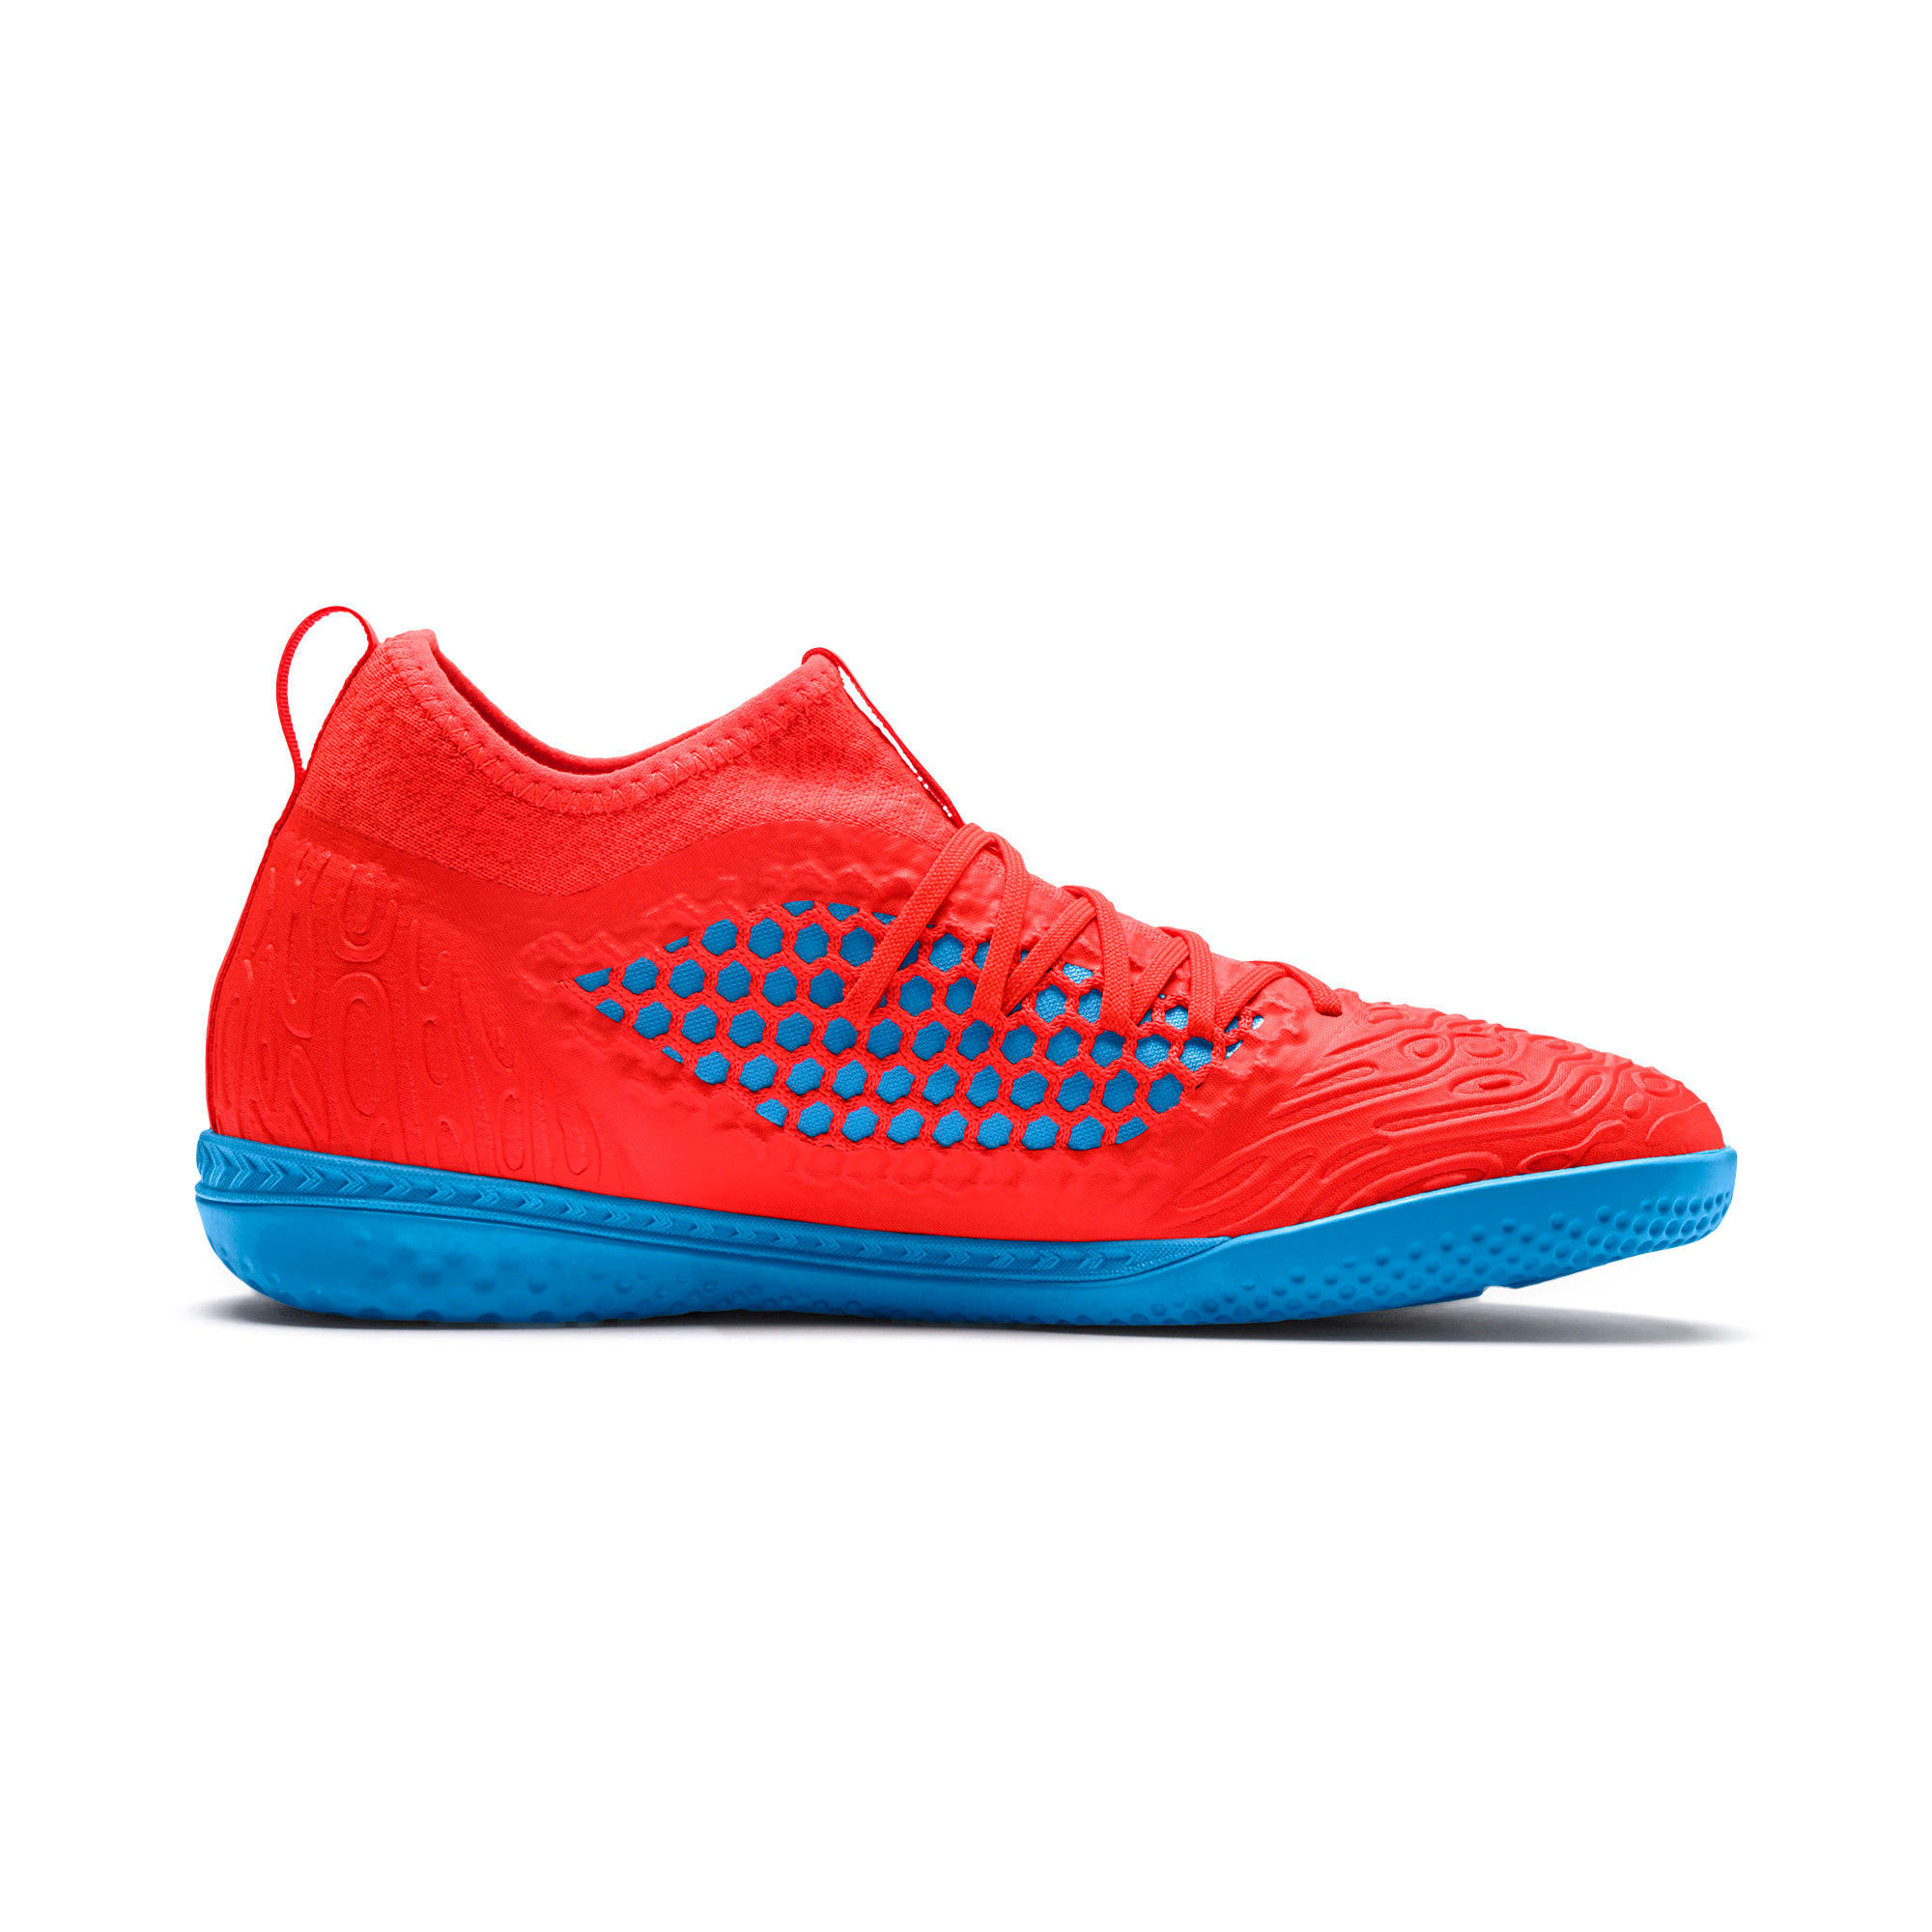 Thumbnail 5 of FUTURE 19.3 NETFIT IT Men's Soccer Shoes, Red Blast-Bleu Azur, medium